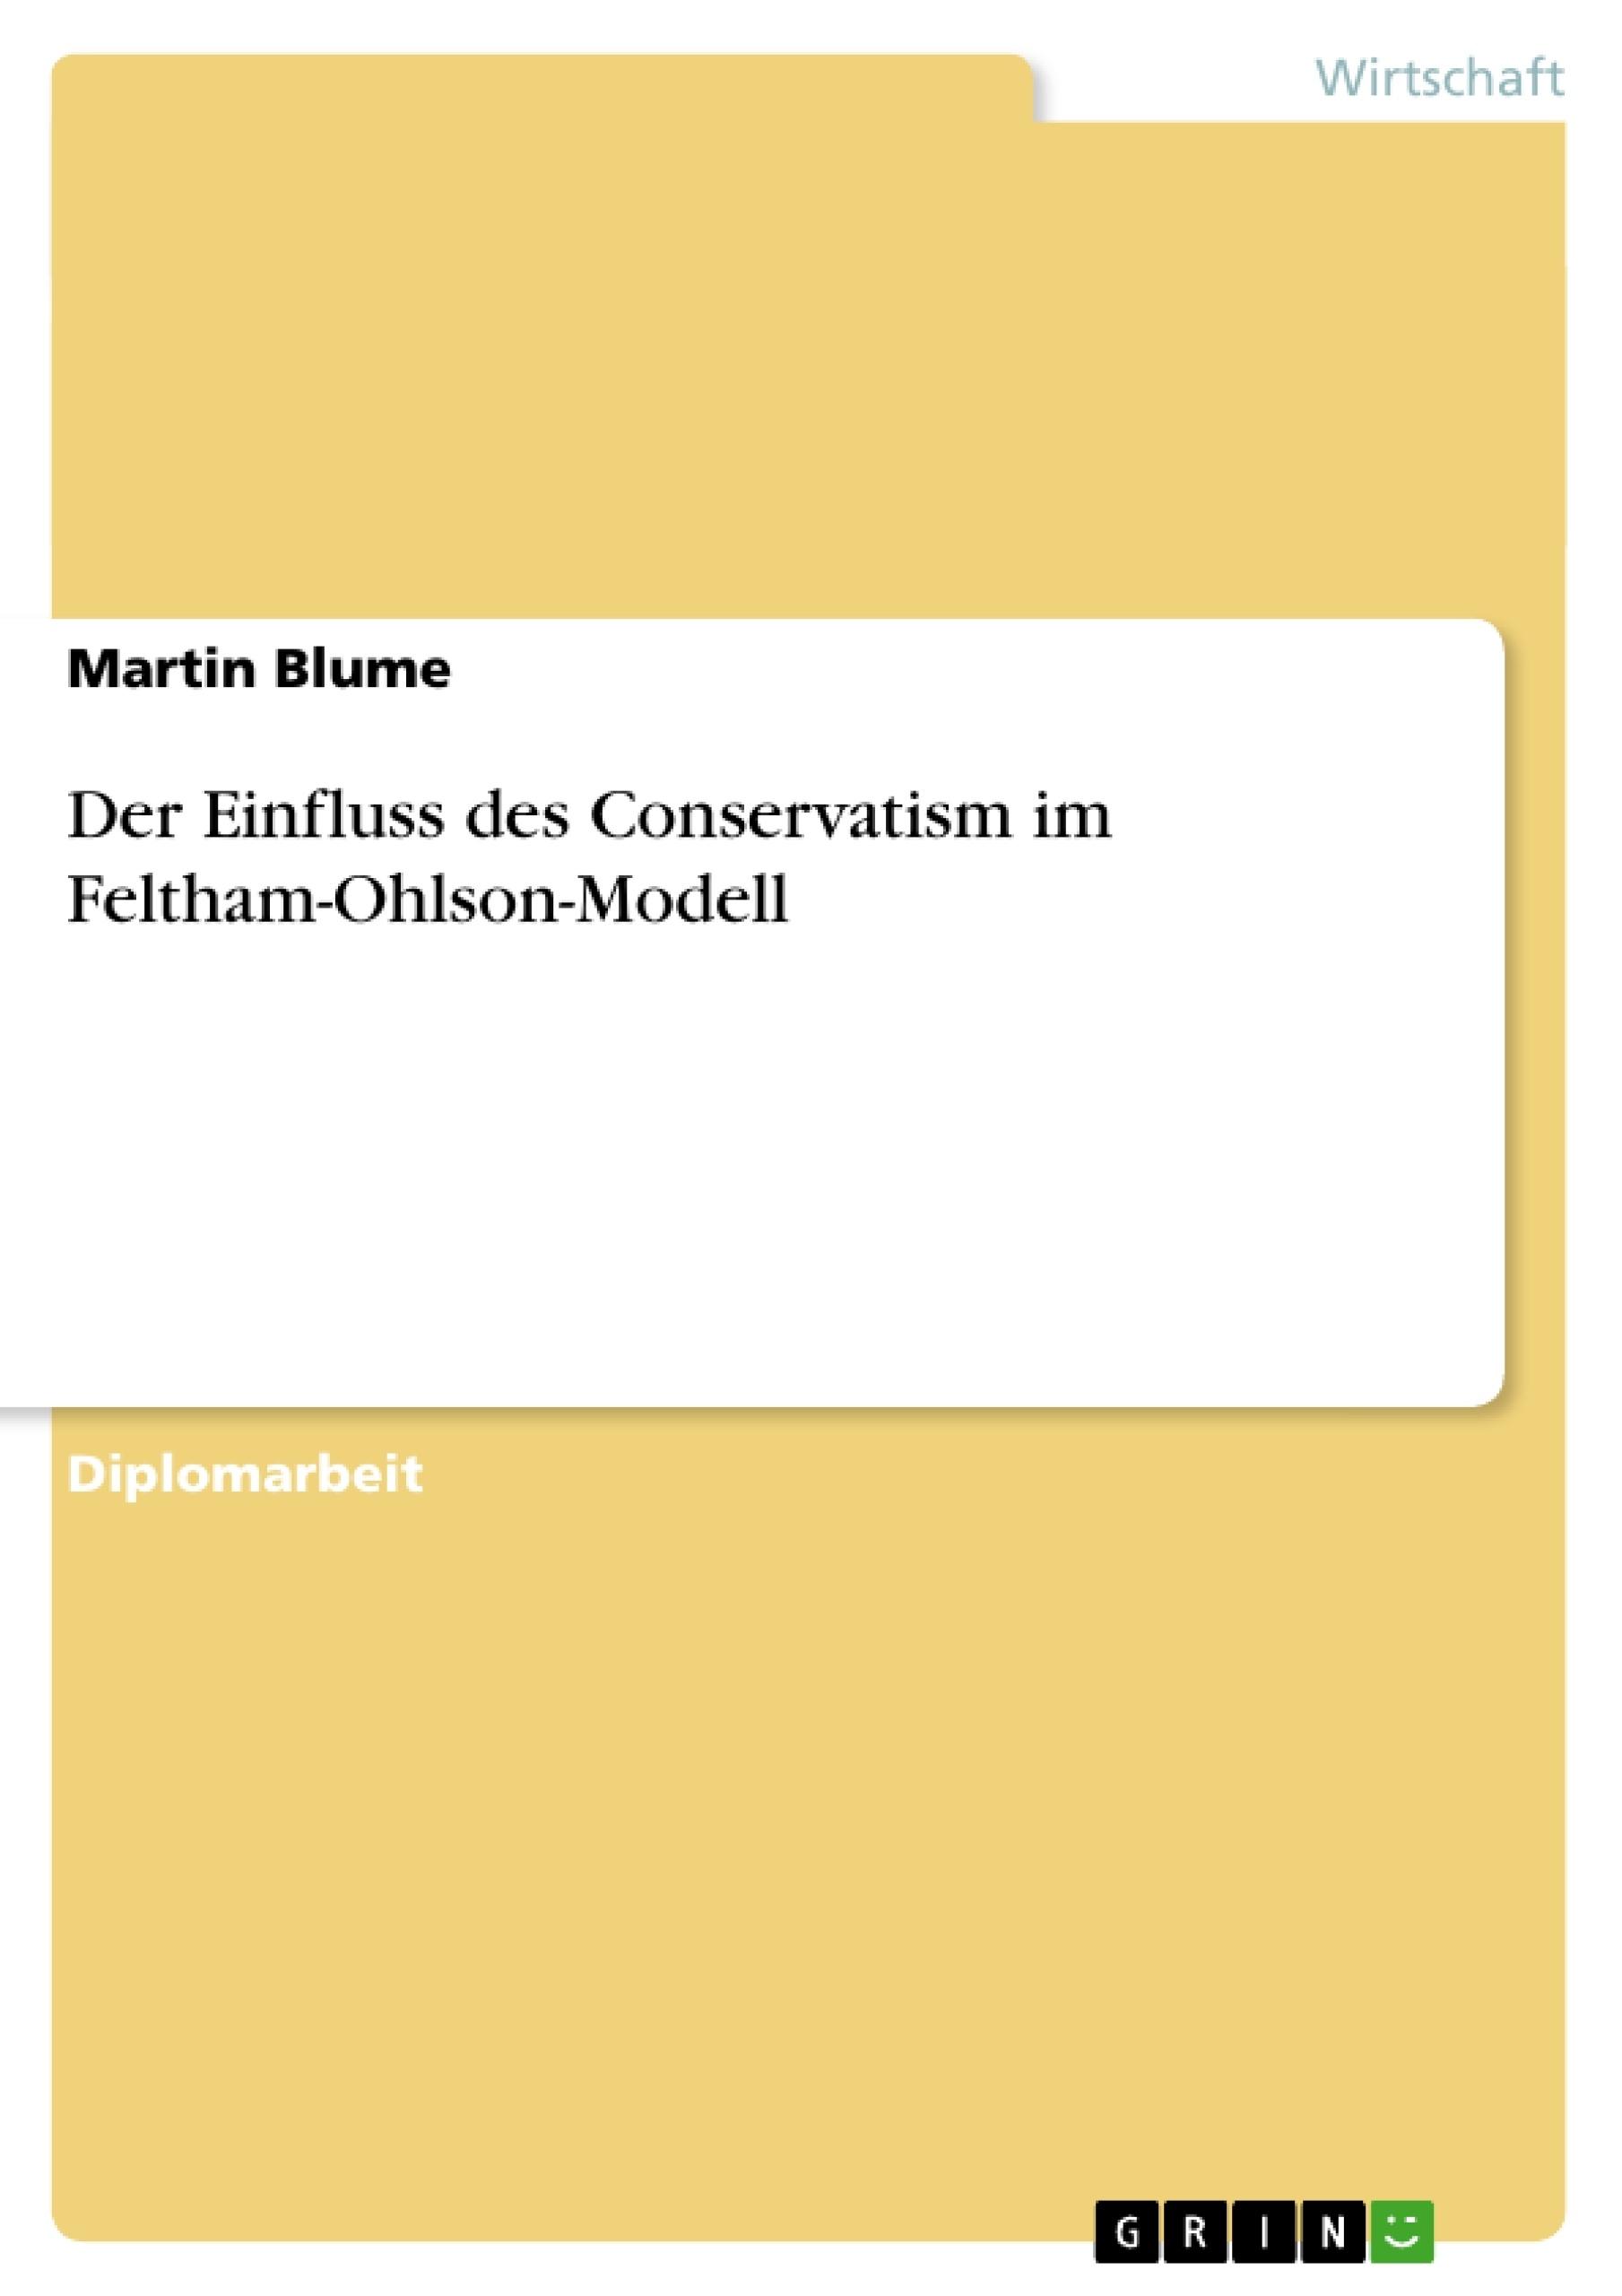 Titel: Der Einfluss des Conservatism im Feltham-Ohlson-Modell